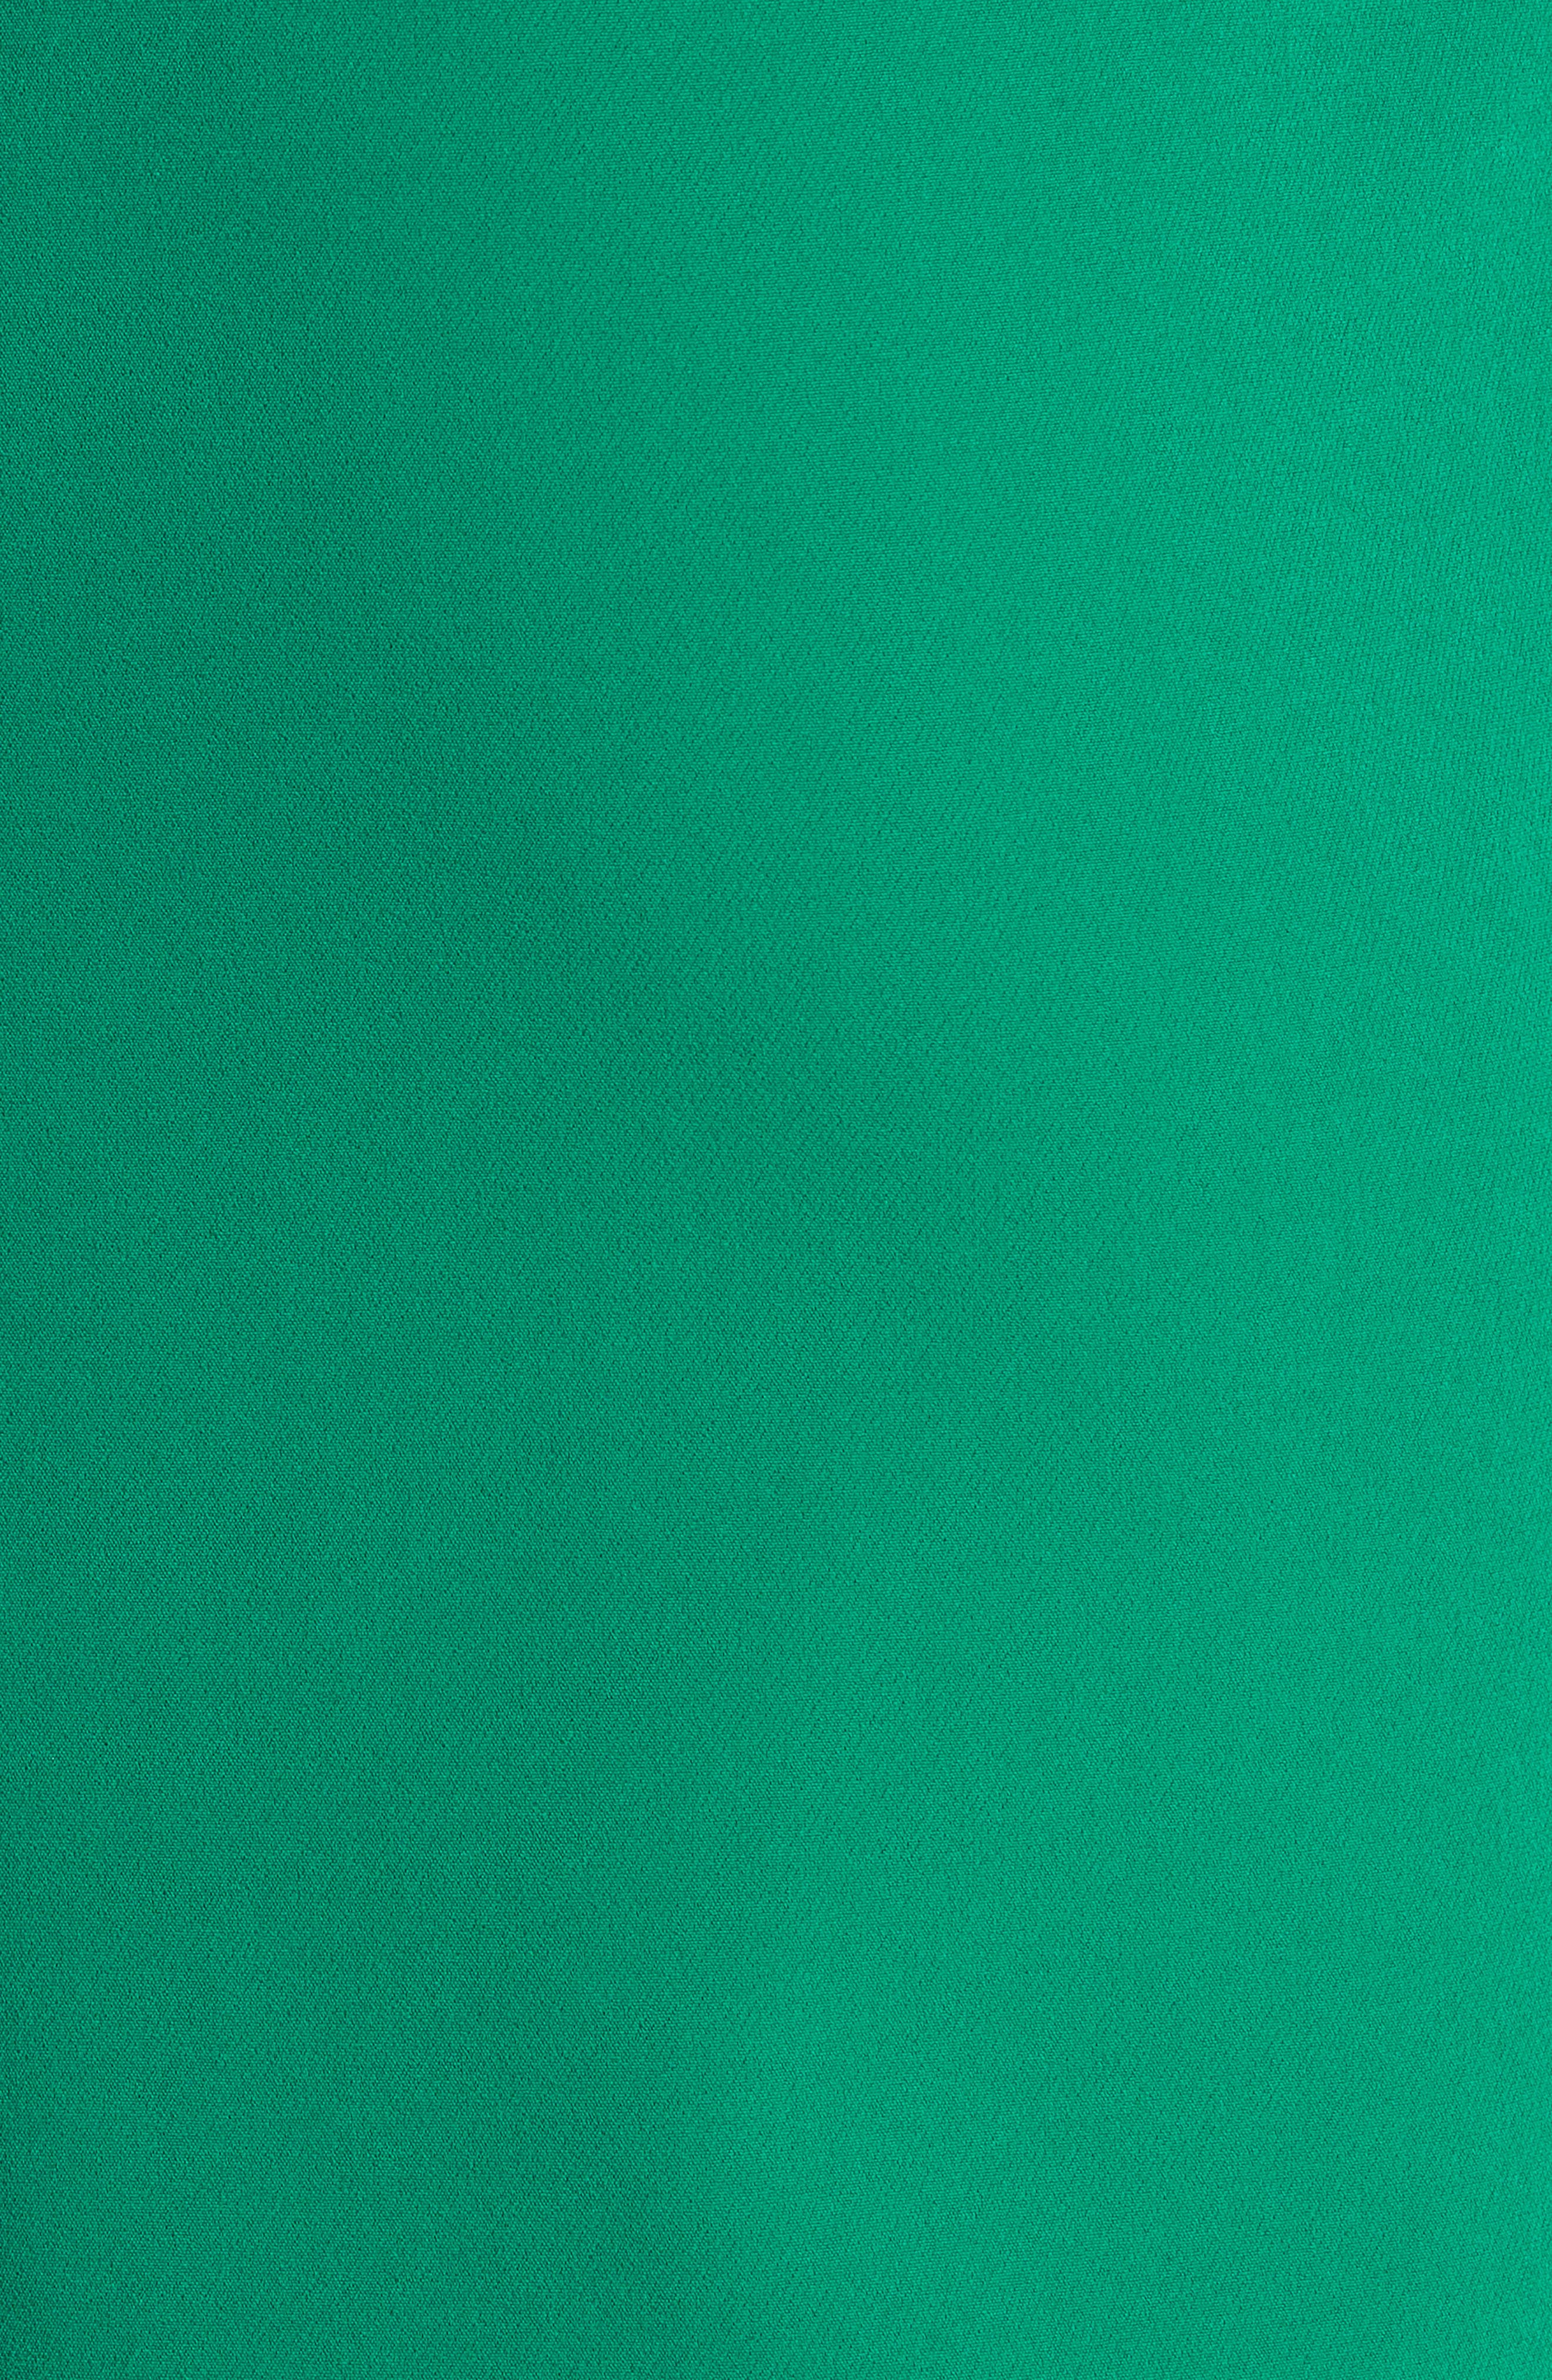 Luna Cutout Detail Crepe Sheath Dress,                             Alternate thumbnail 5, color,                             Emerald